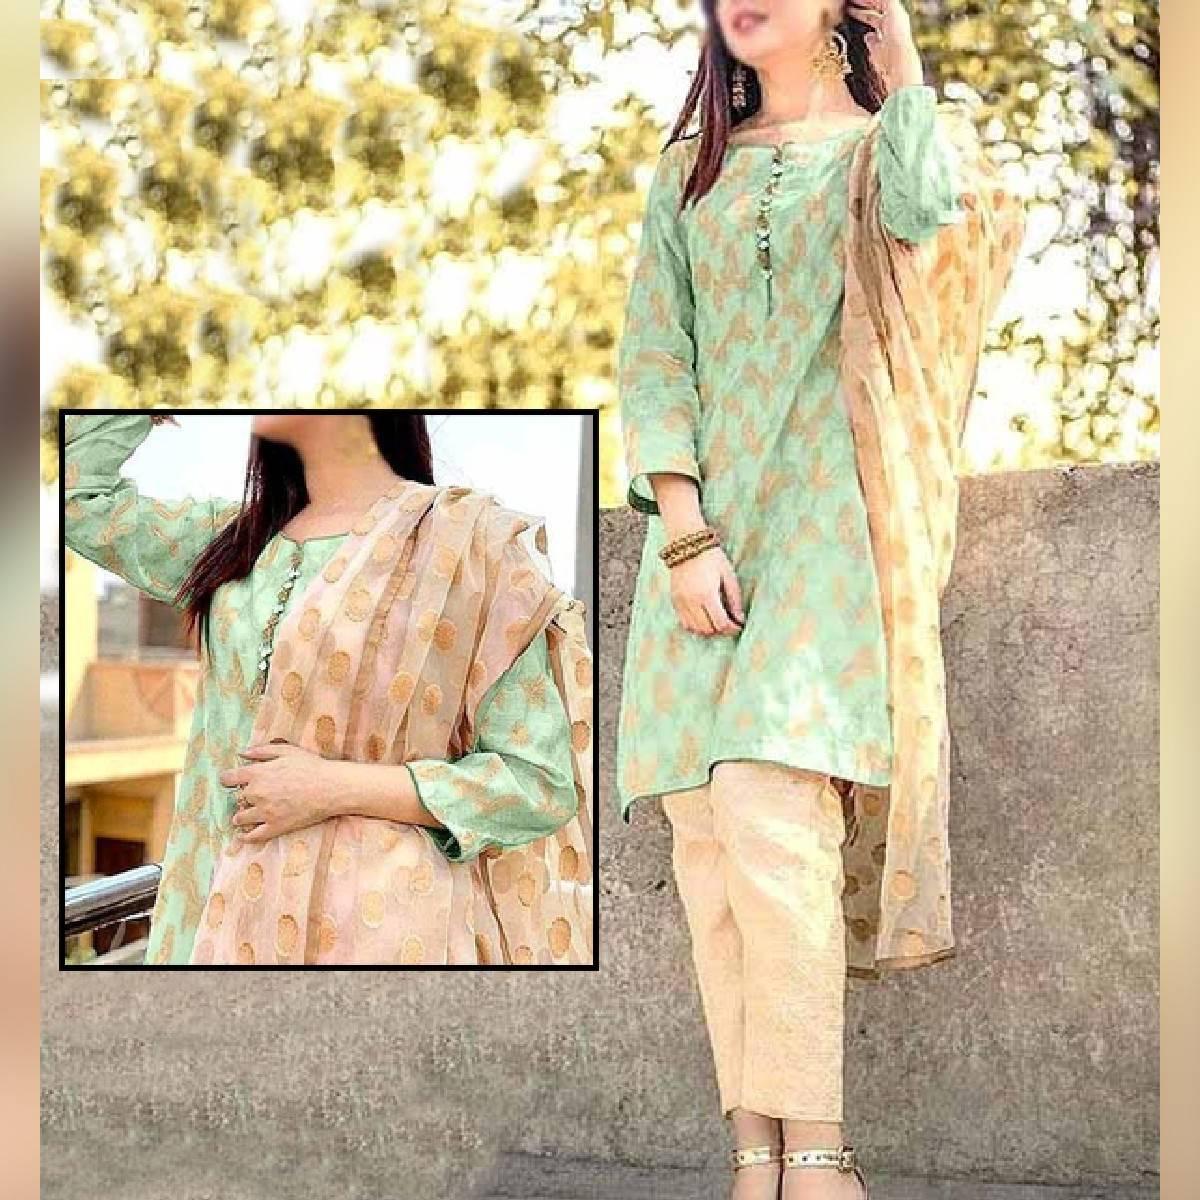 Banarsi Style Cotton Jacquard Suit with Organza Jacquard Dupatta (DRL-728)